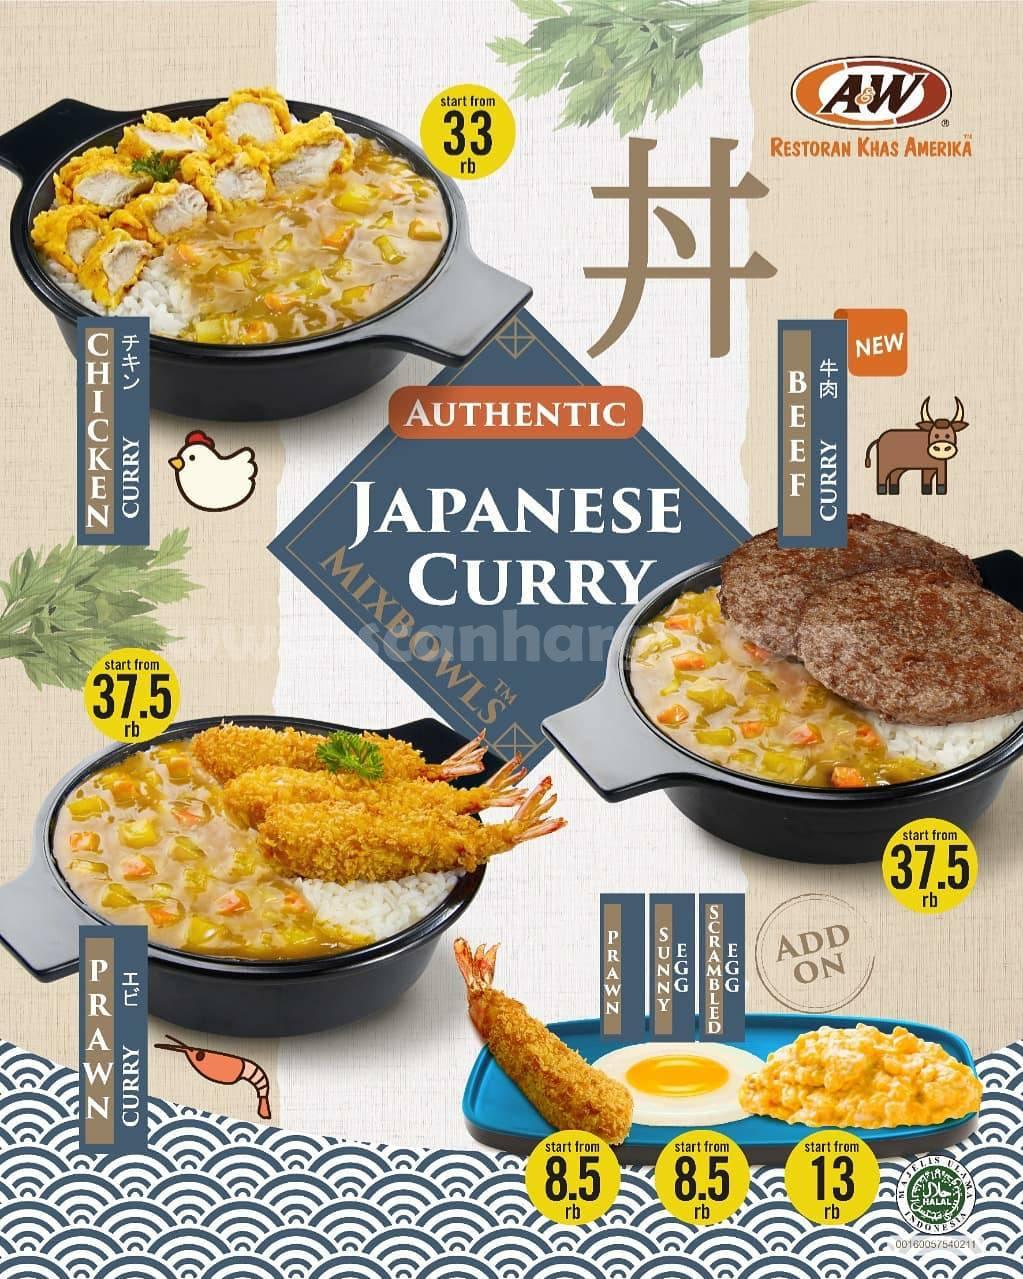 BARU! A&W JAPANESE CURRY MIXBOWL harga mulai Rp. 8.5 Ribu